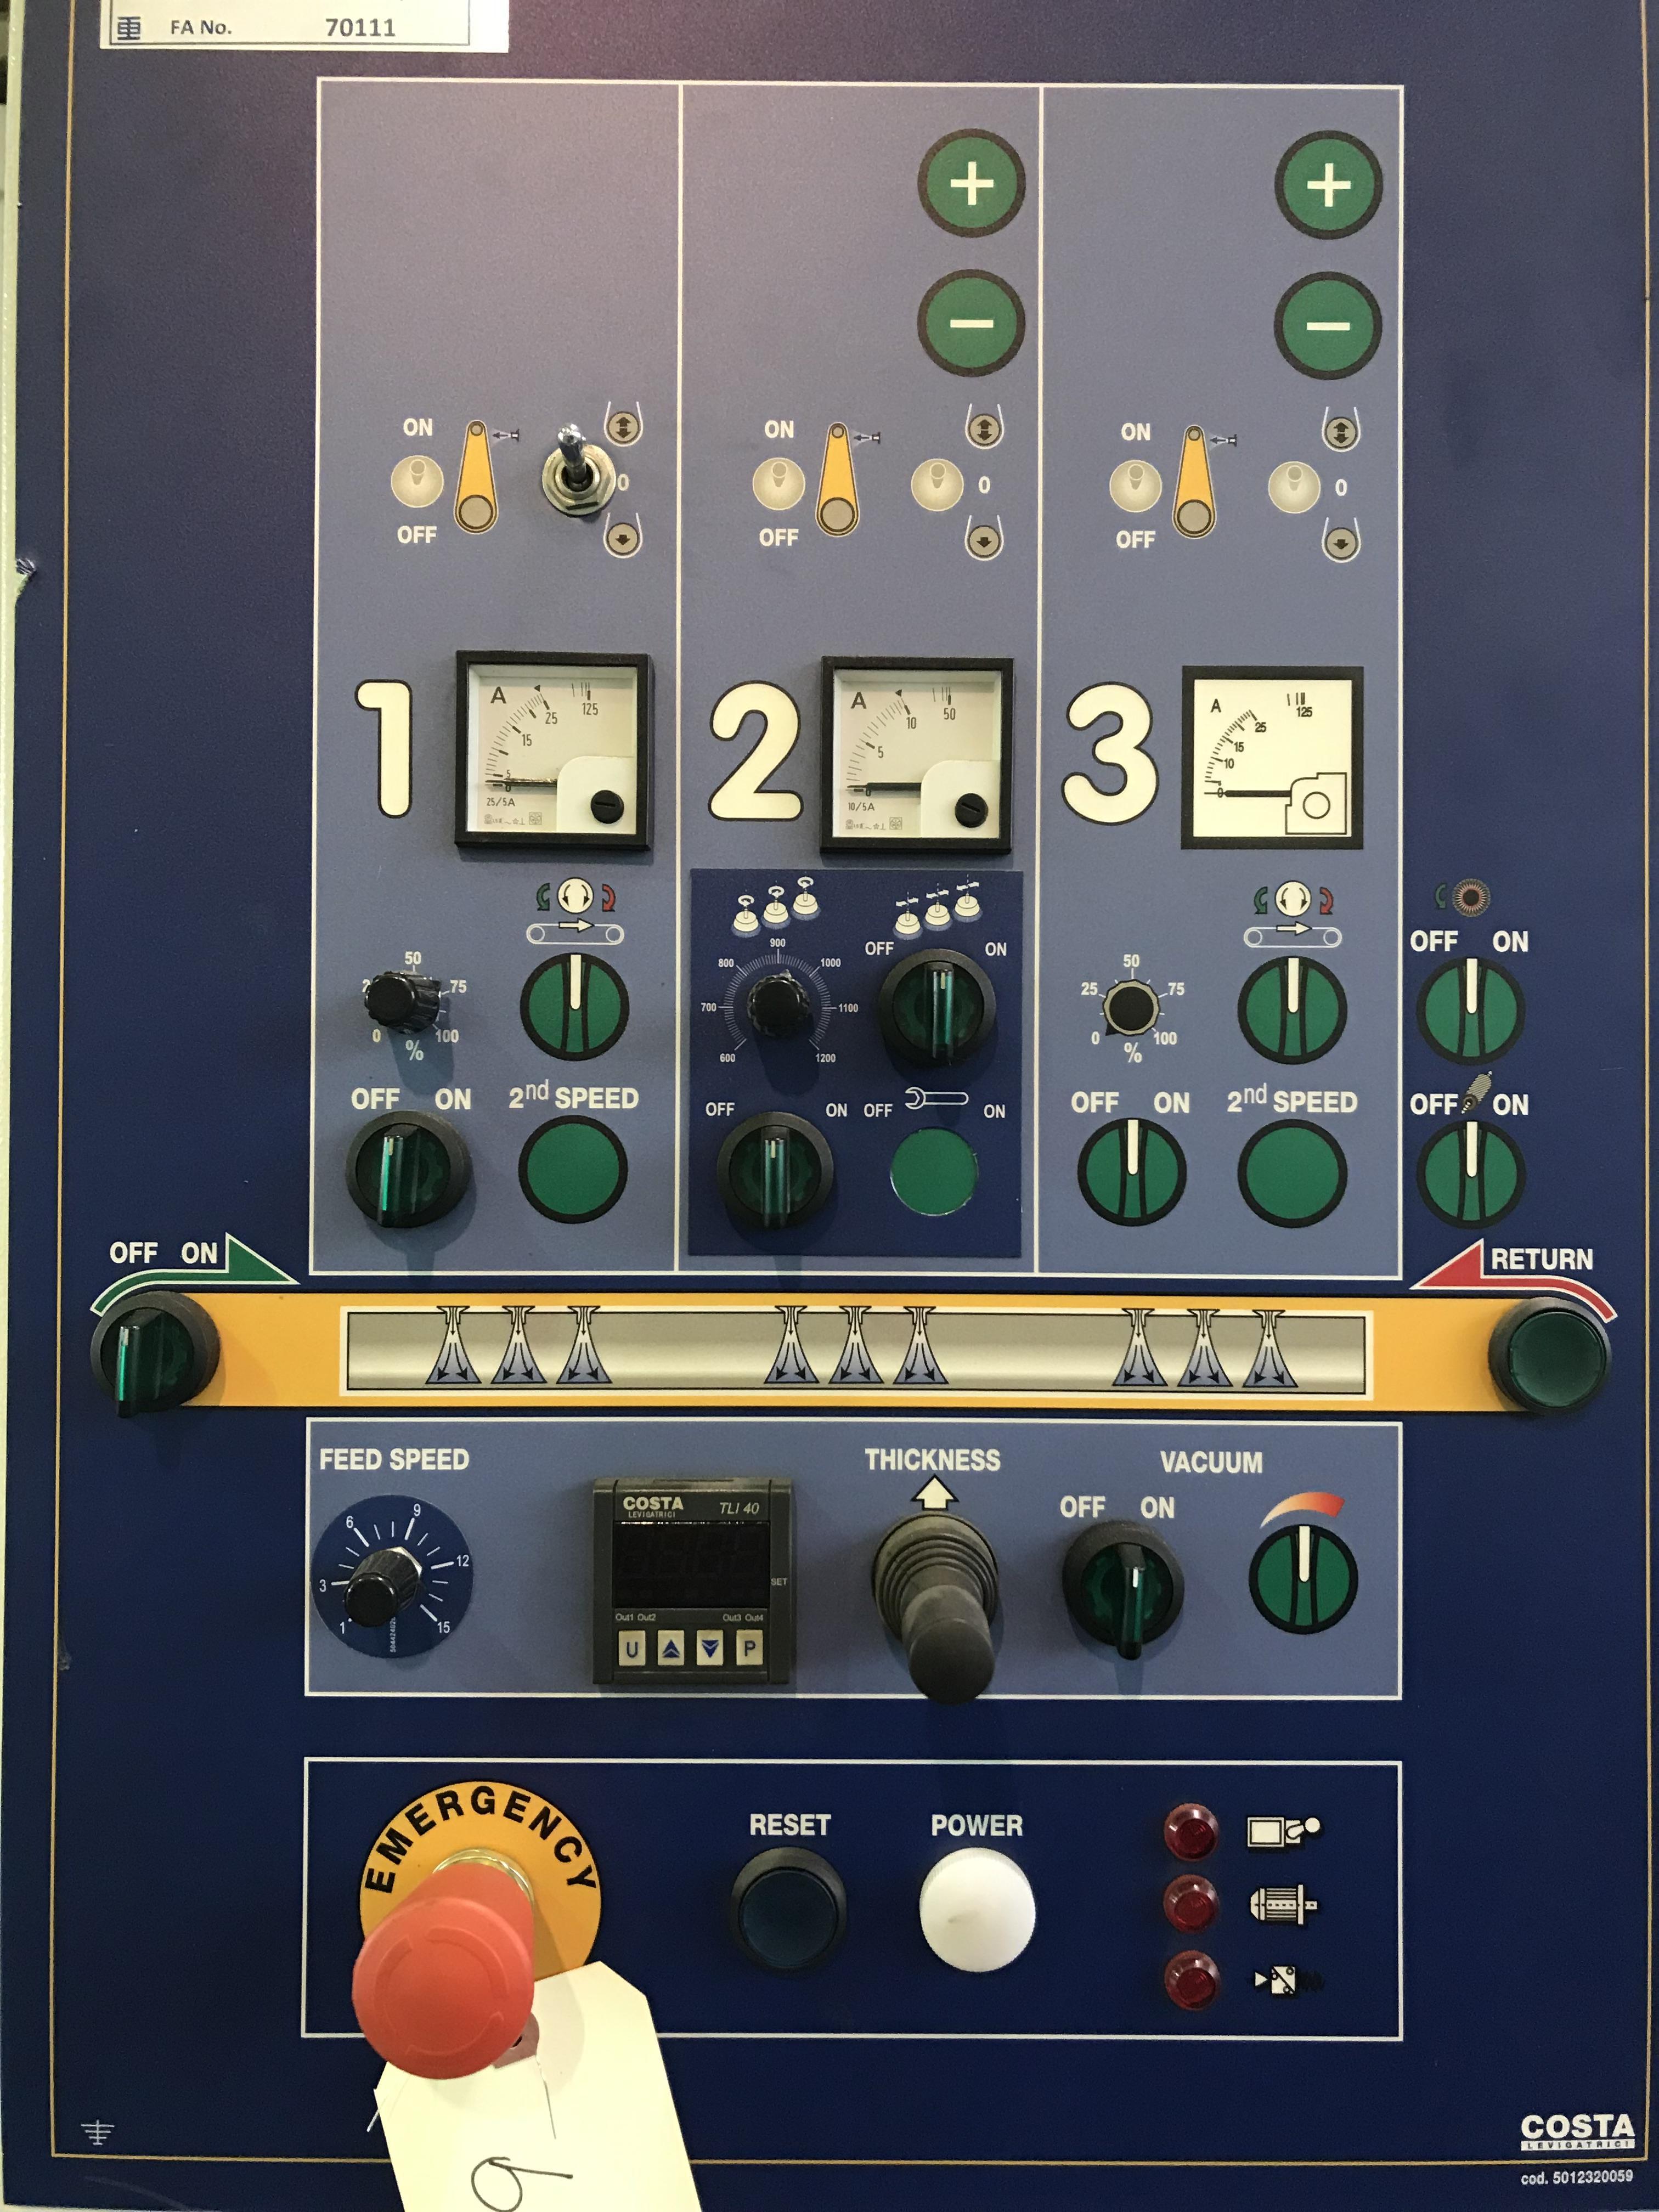 2014 COSTA MD5 CV 1350 Finishing Machine (#3403)